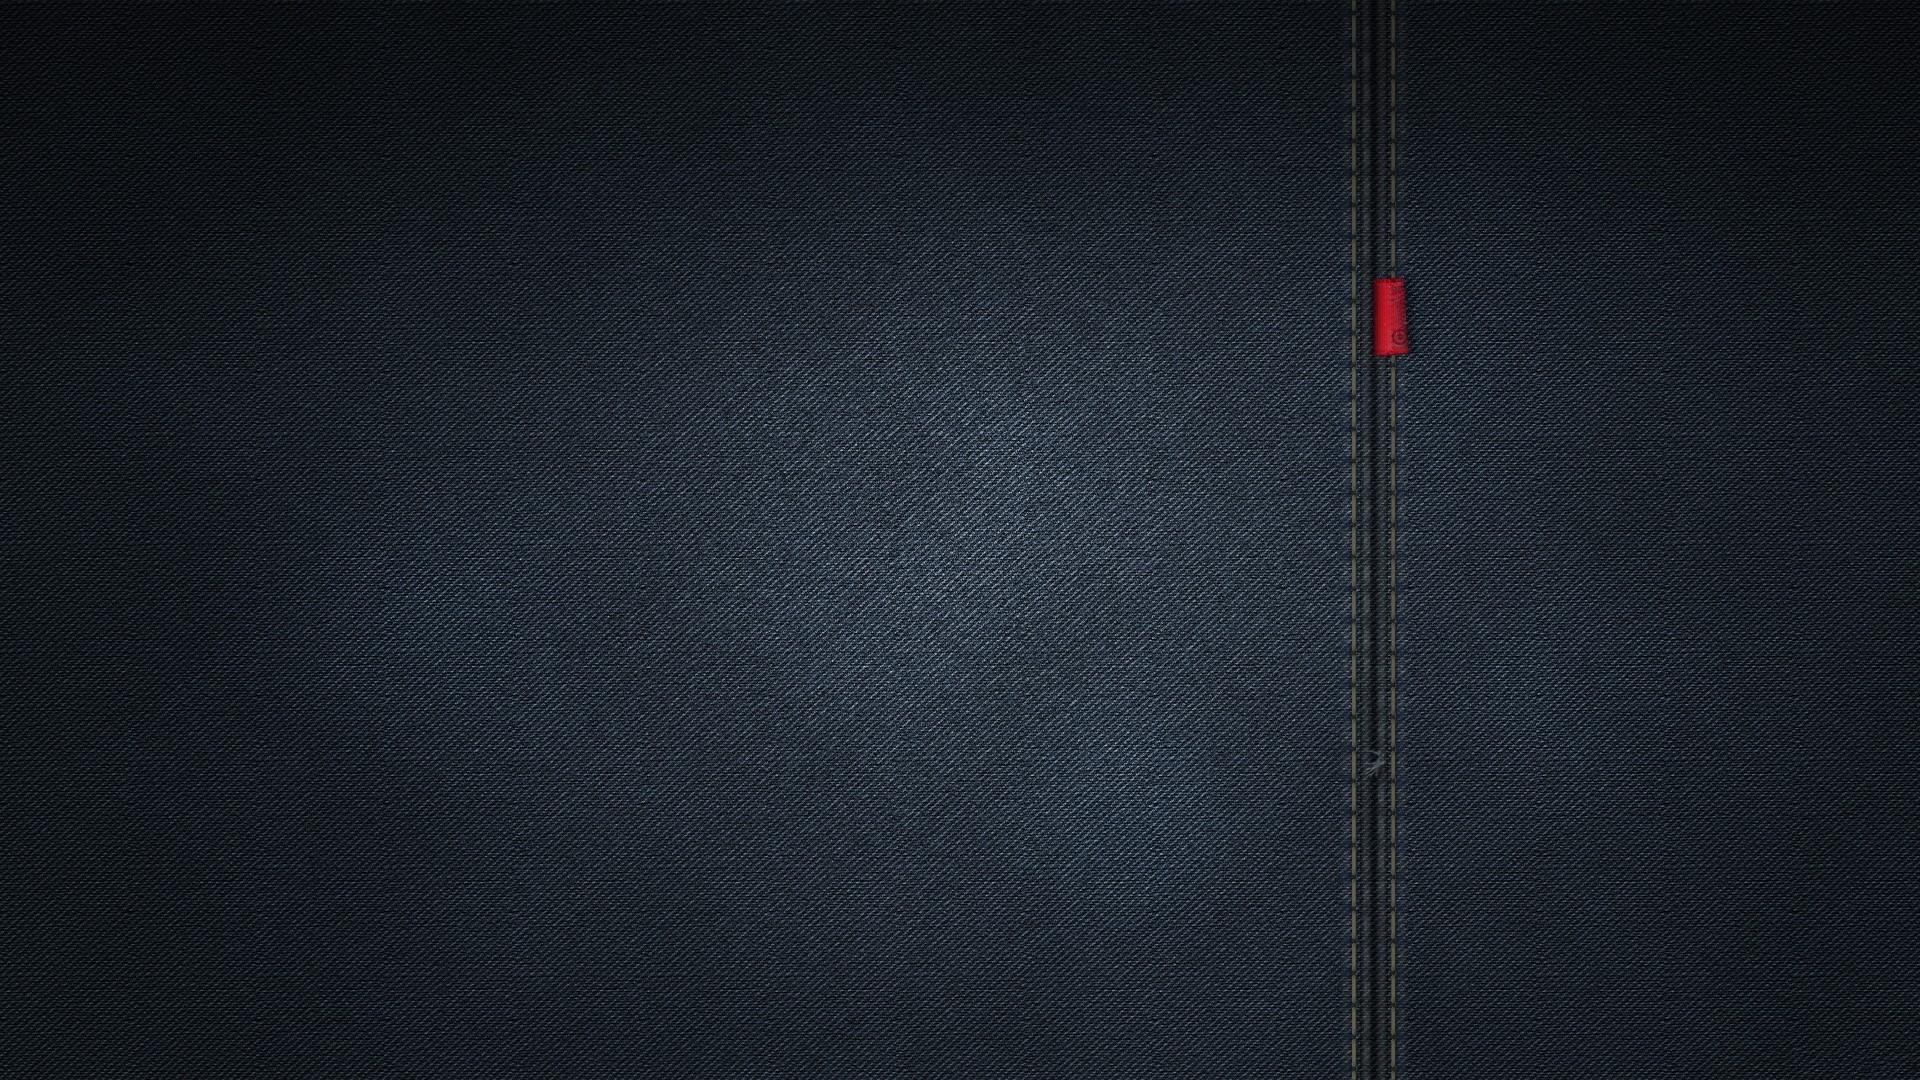 Black Digital Art Abstract Red Jeans Texture Circle Textured Seam Light Lighting Line Darkness Screenshot